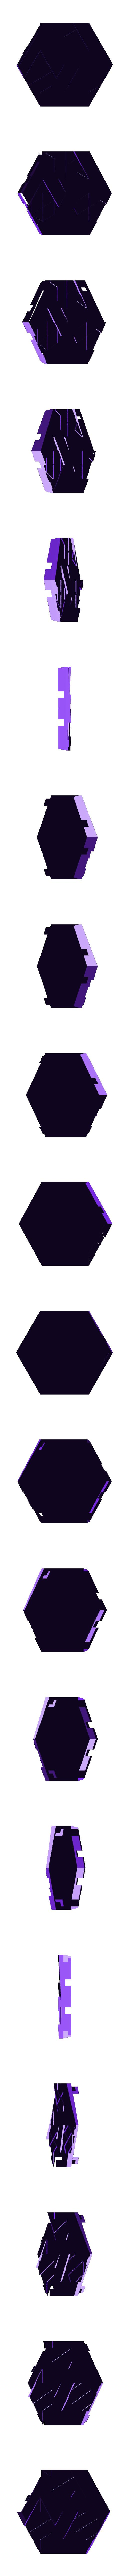 lid.stl Download free STL file Secret geometry medallion • 3D printable model, Job